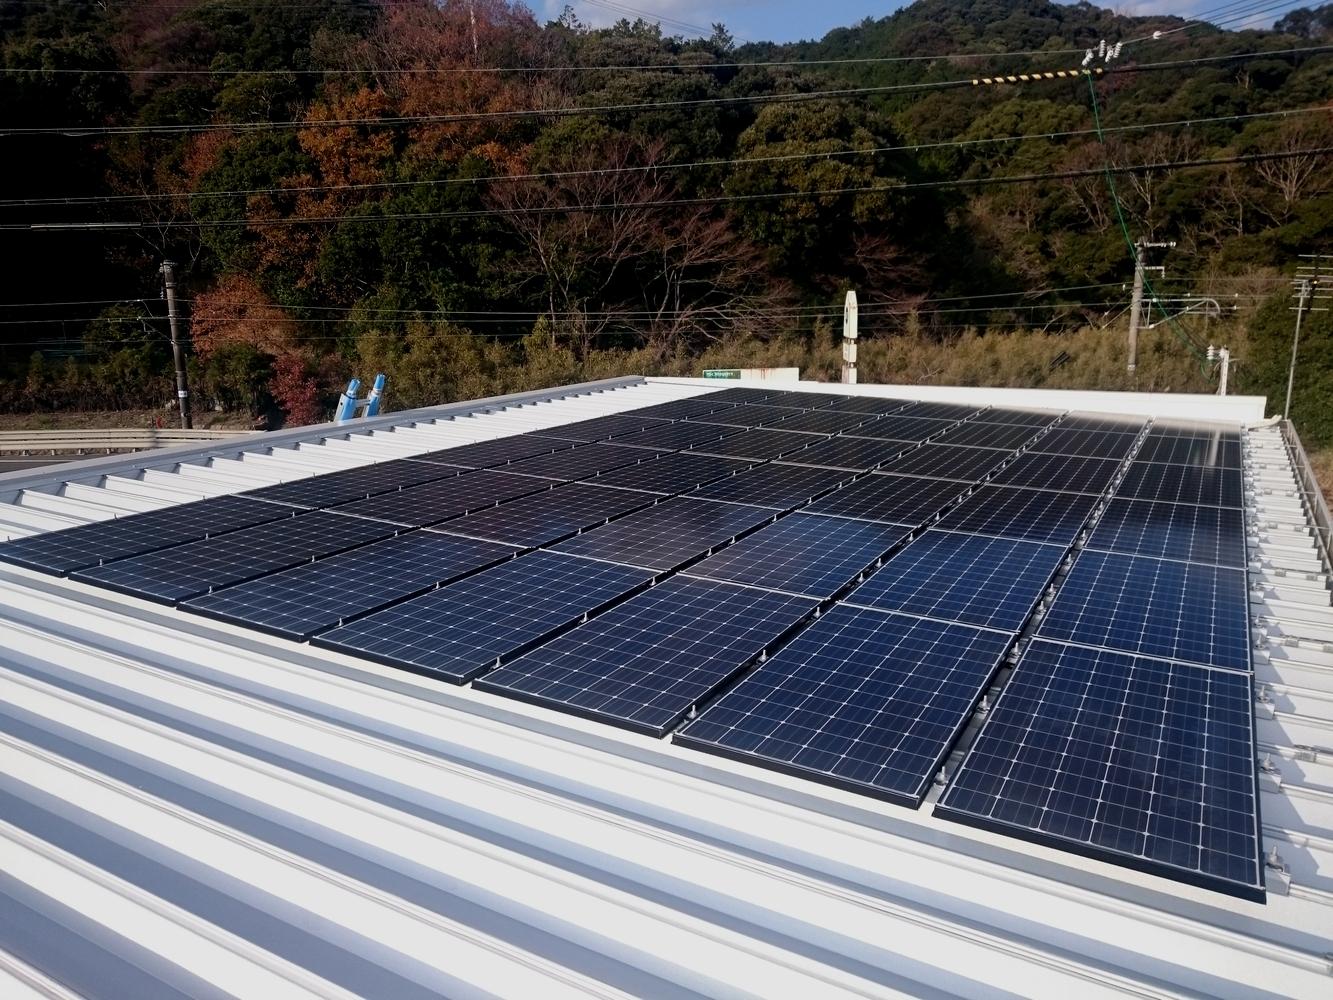 長州産業太陽光発電パネル外観写真